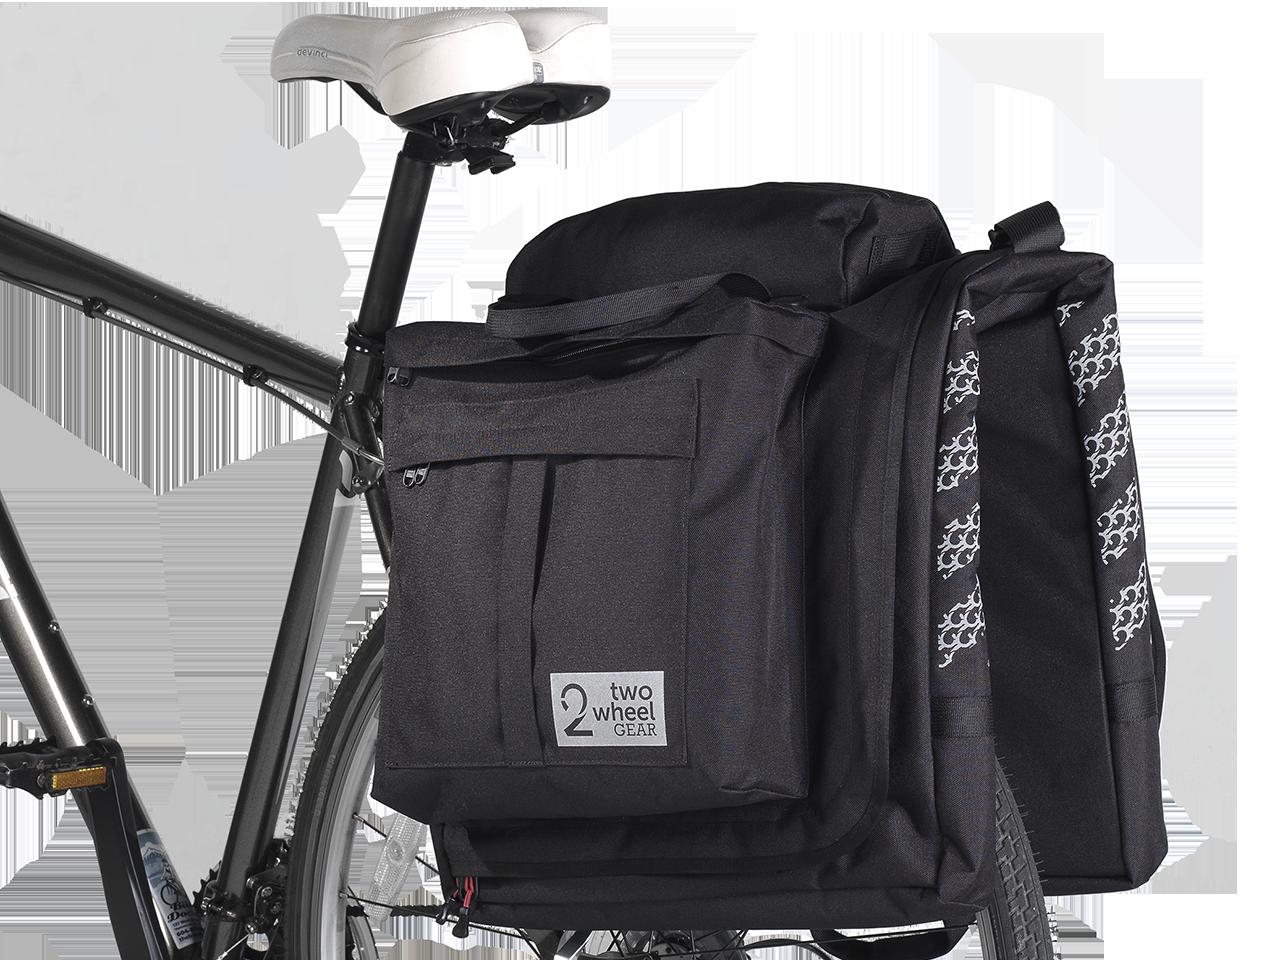 Clipart backpack hang backpack. Bike suit bag garment